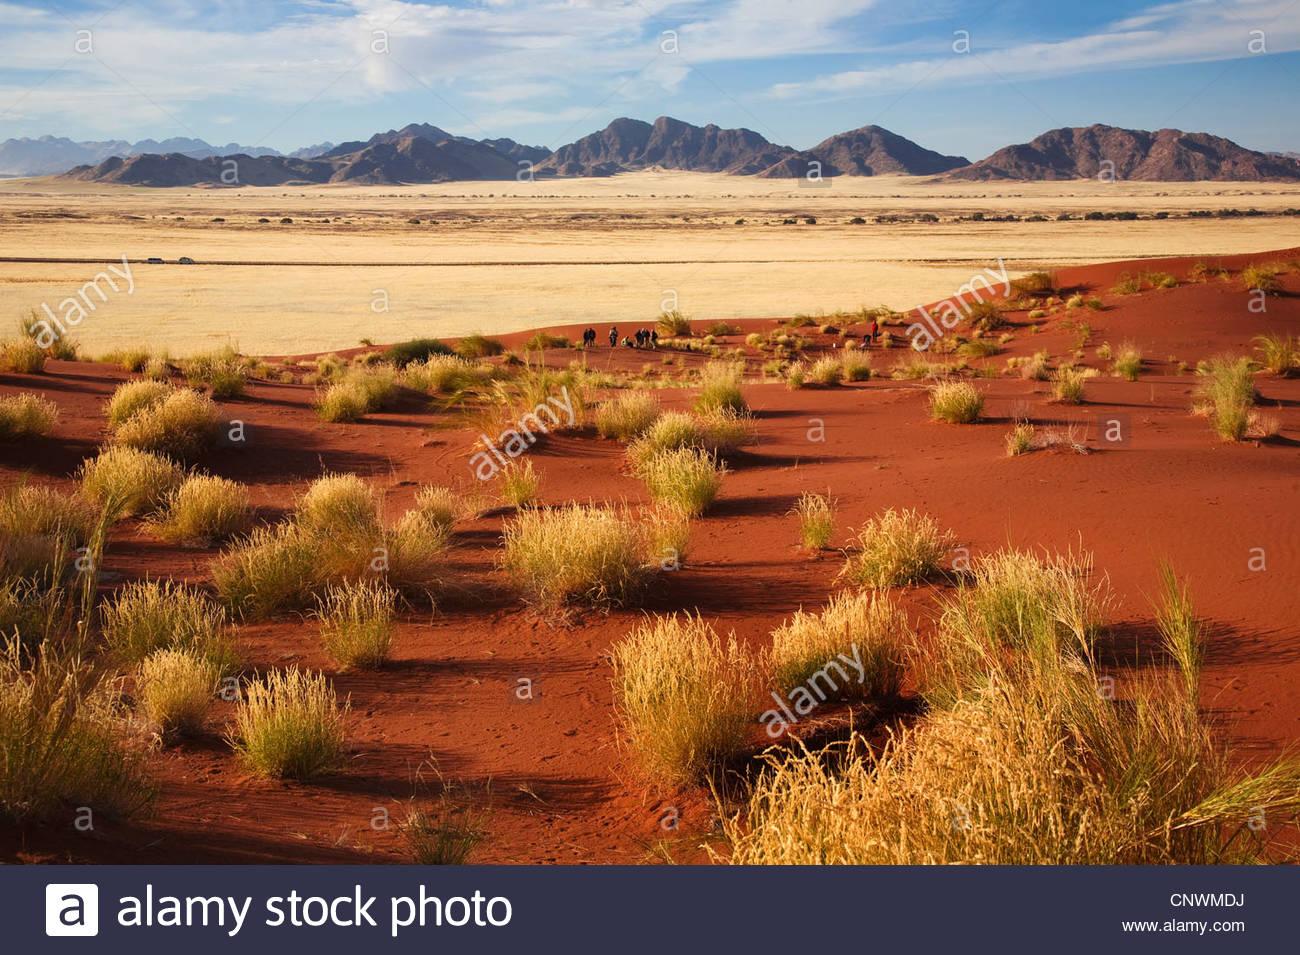 grasses in Namib desert, Namibia, Namibrand - Stock Image